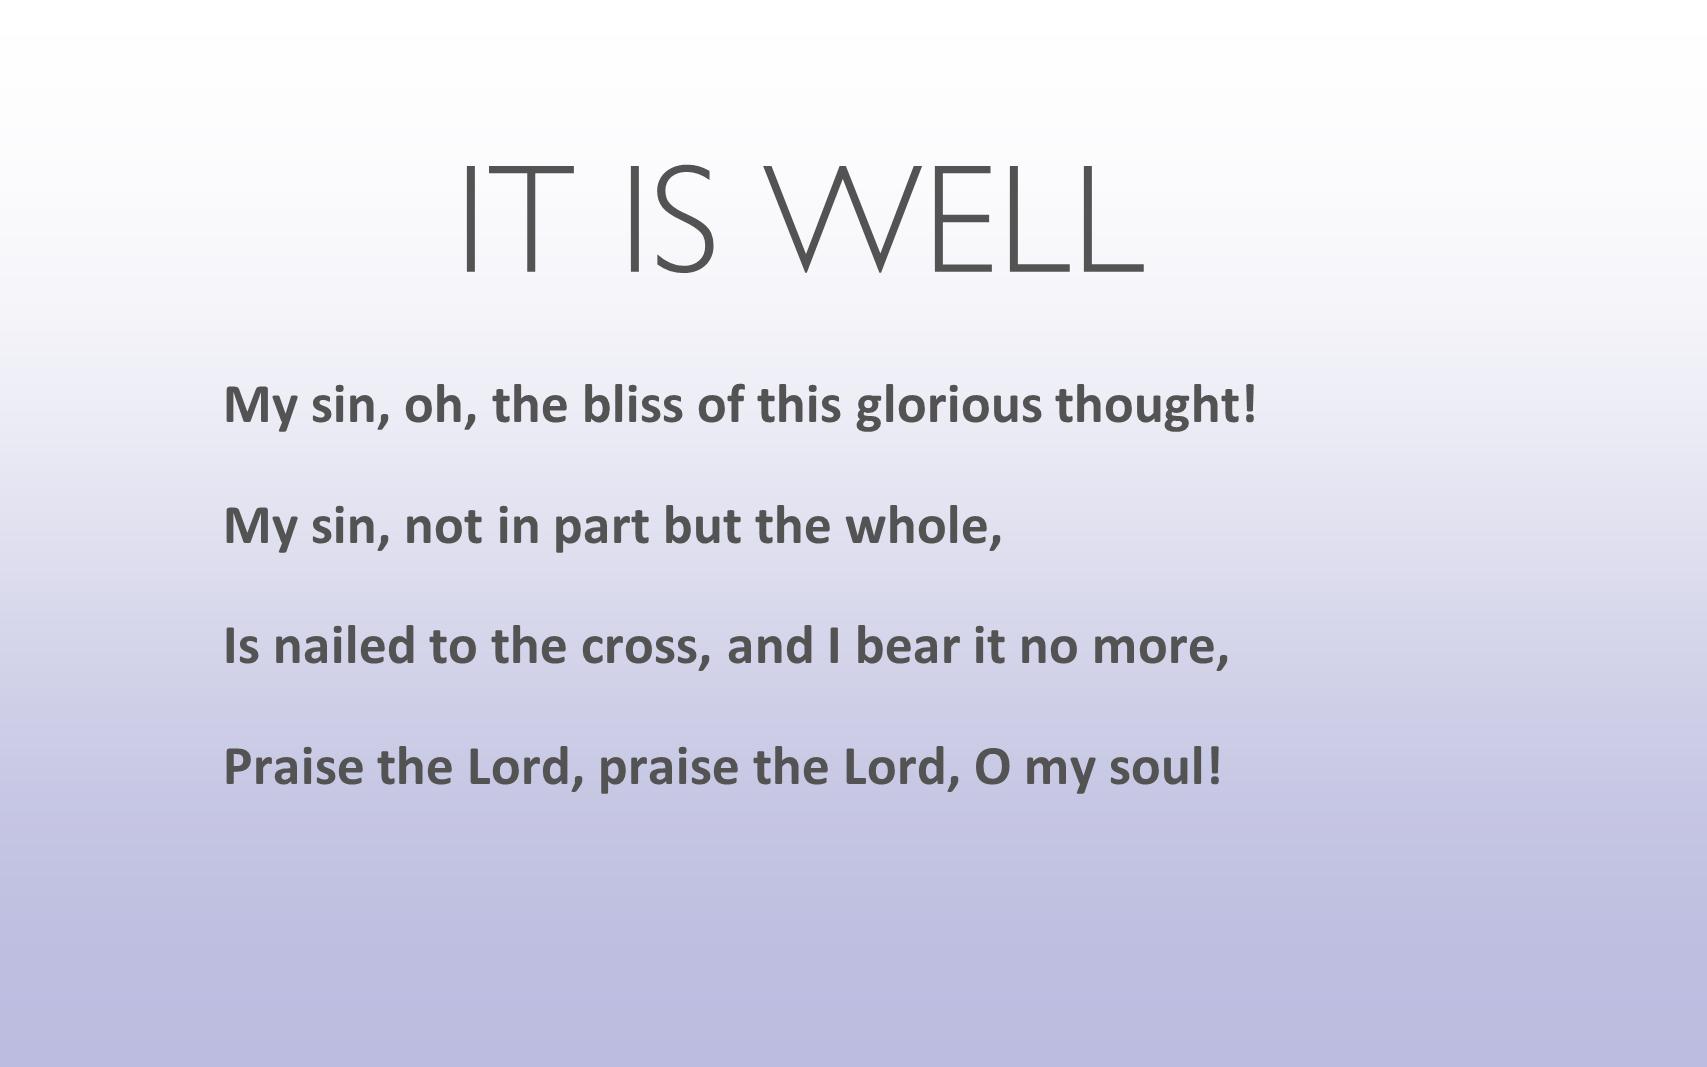 WCC-03 - Proclaiming Christ's Cross Regularly (12)